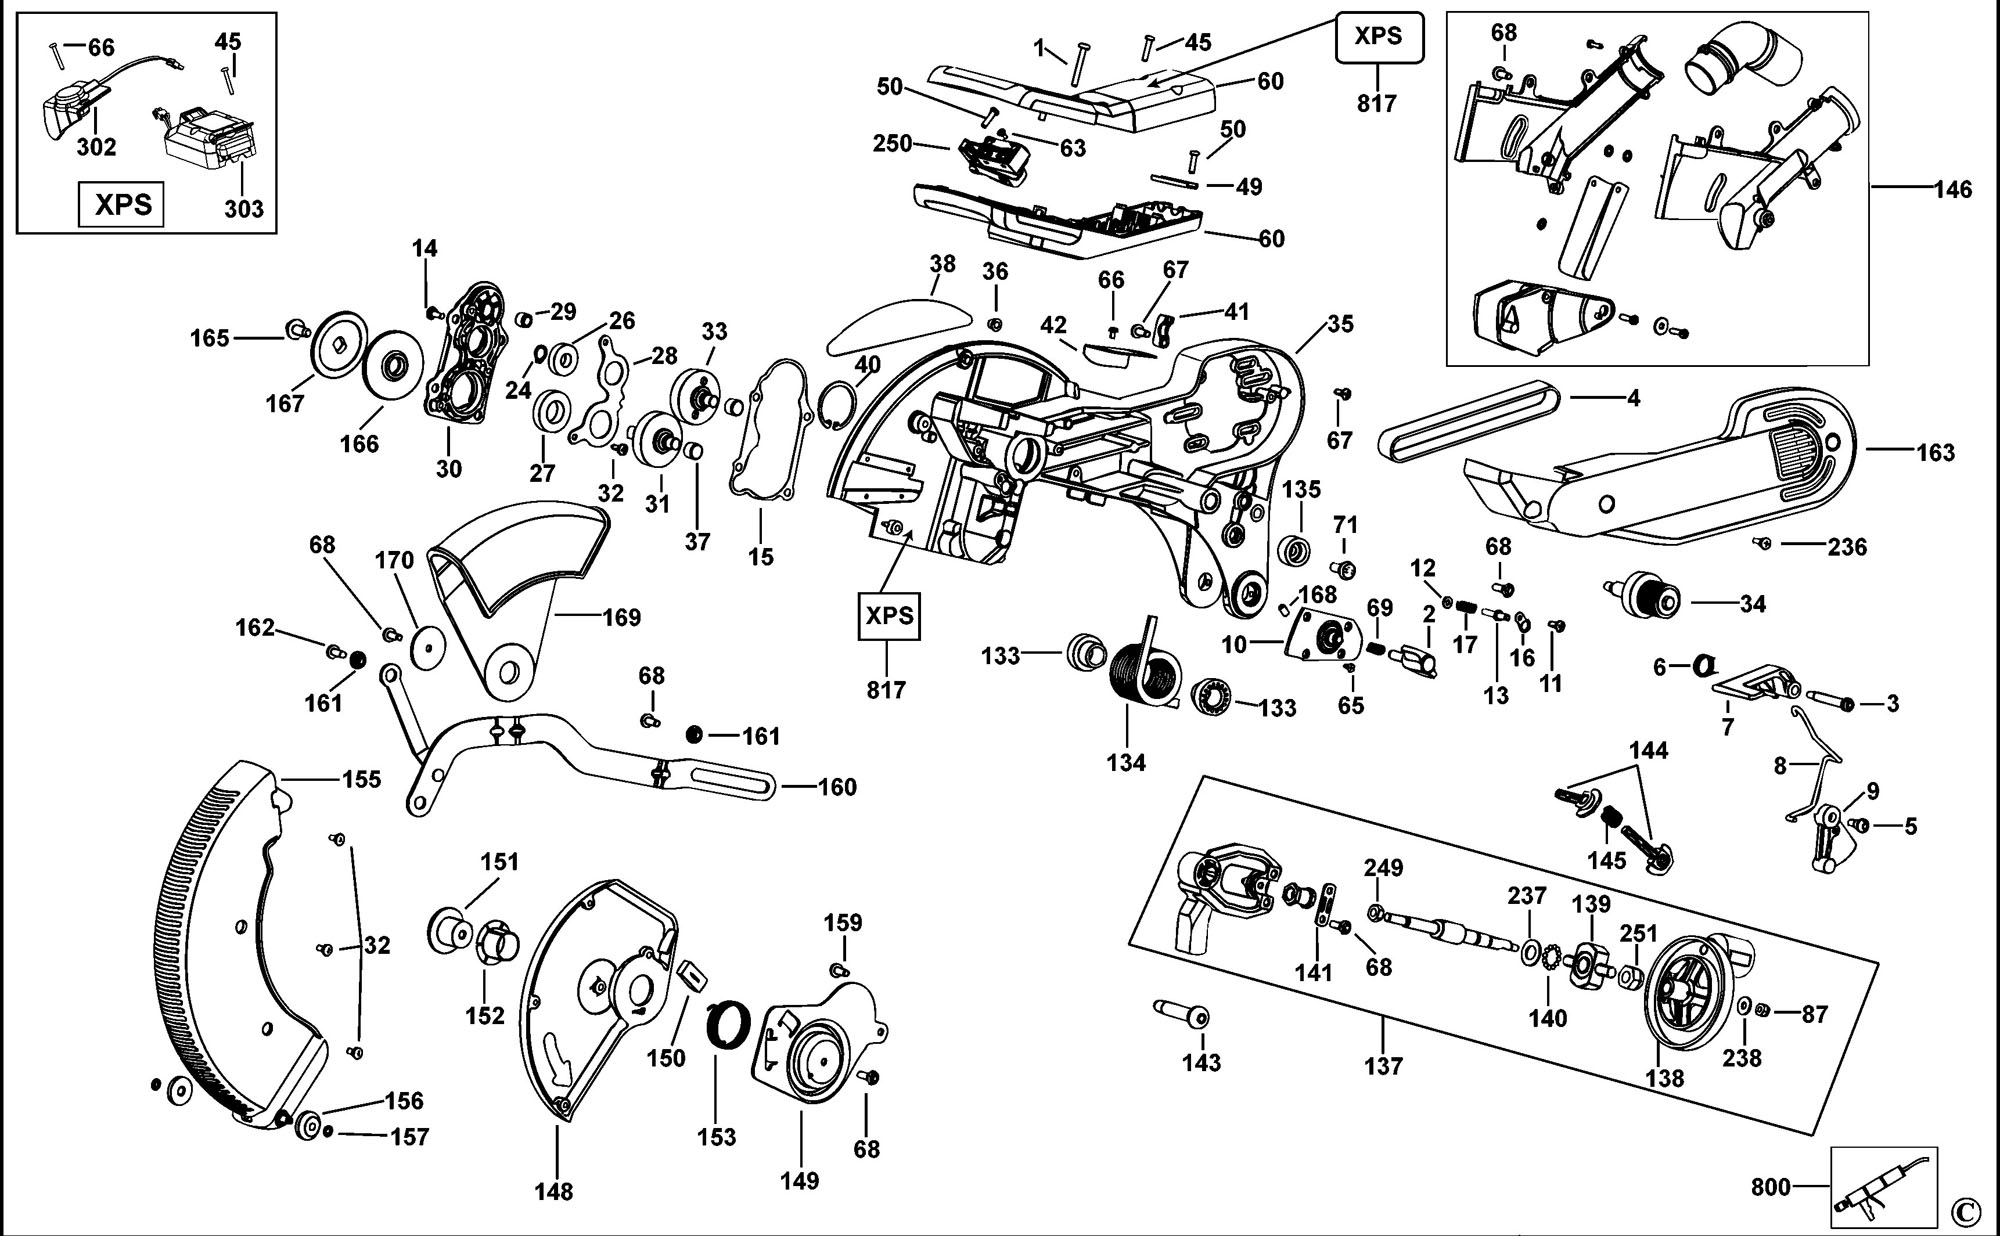 spares for dewalt d27107 combination saw type 4 spare d27107 click for bigger diagram click for bigger diagram